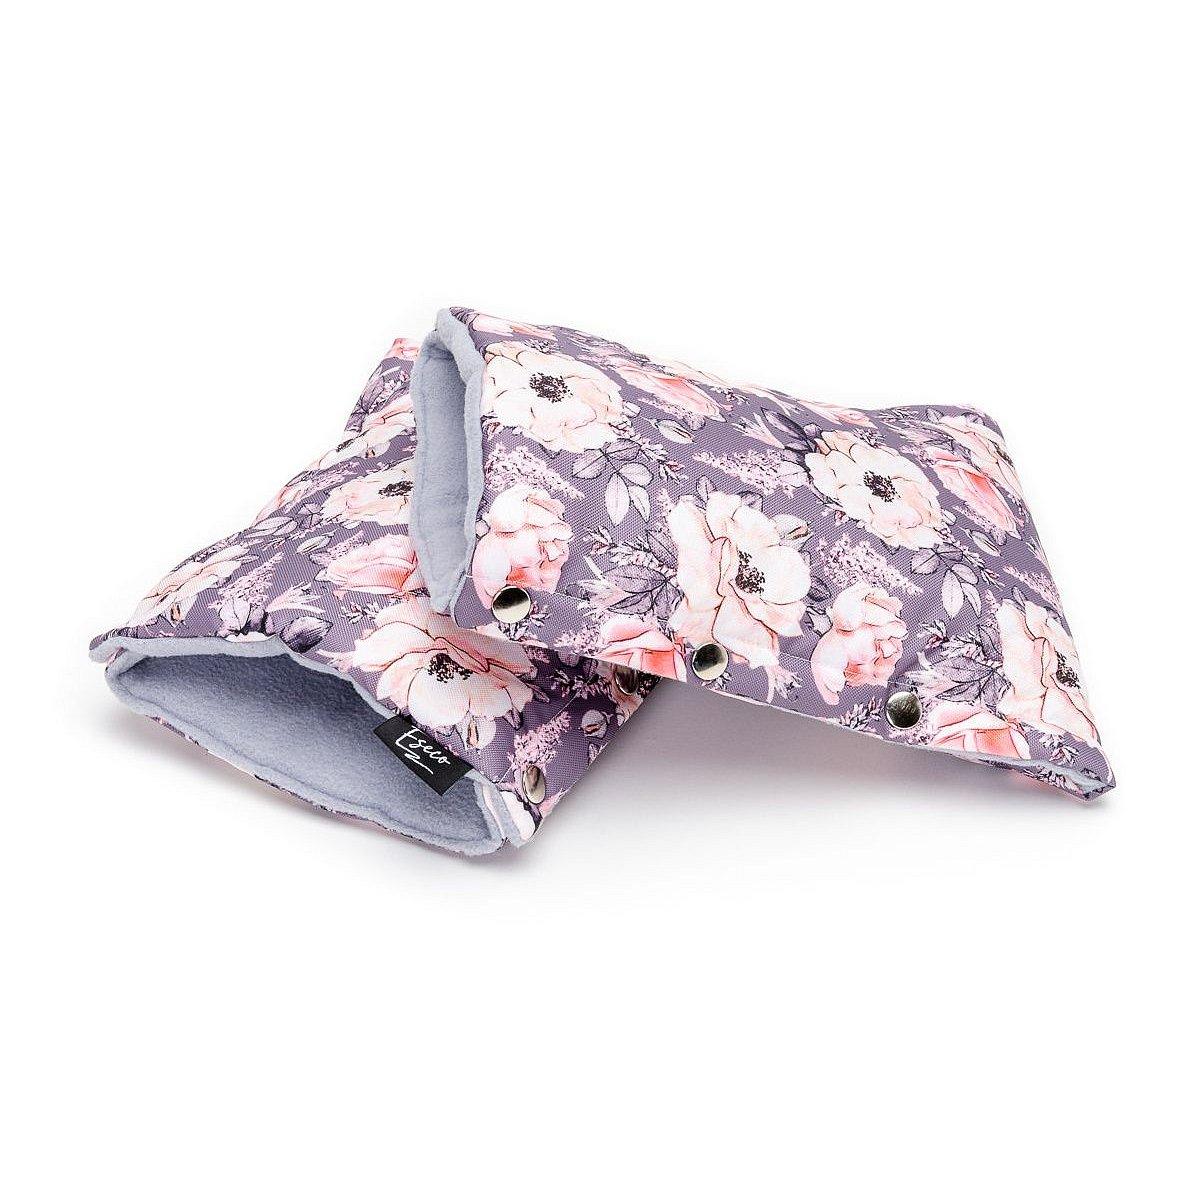 ESECO Rukavice na kočárek Grey flowers 2 ks